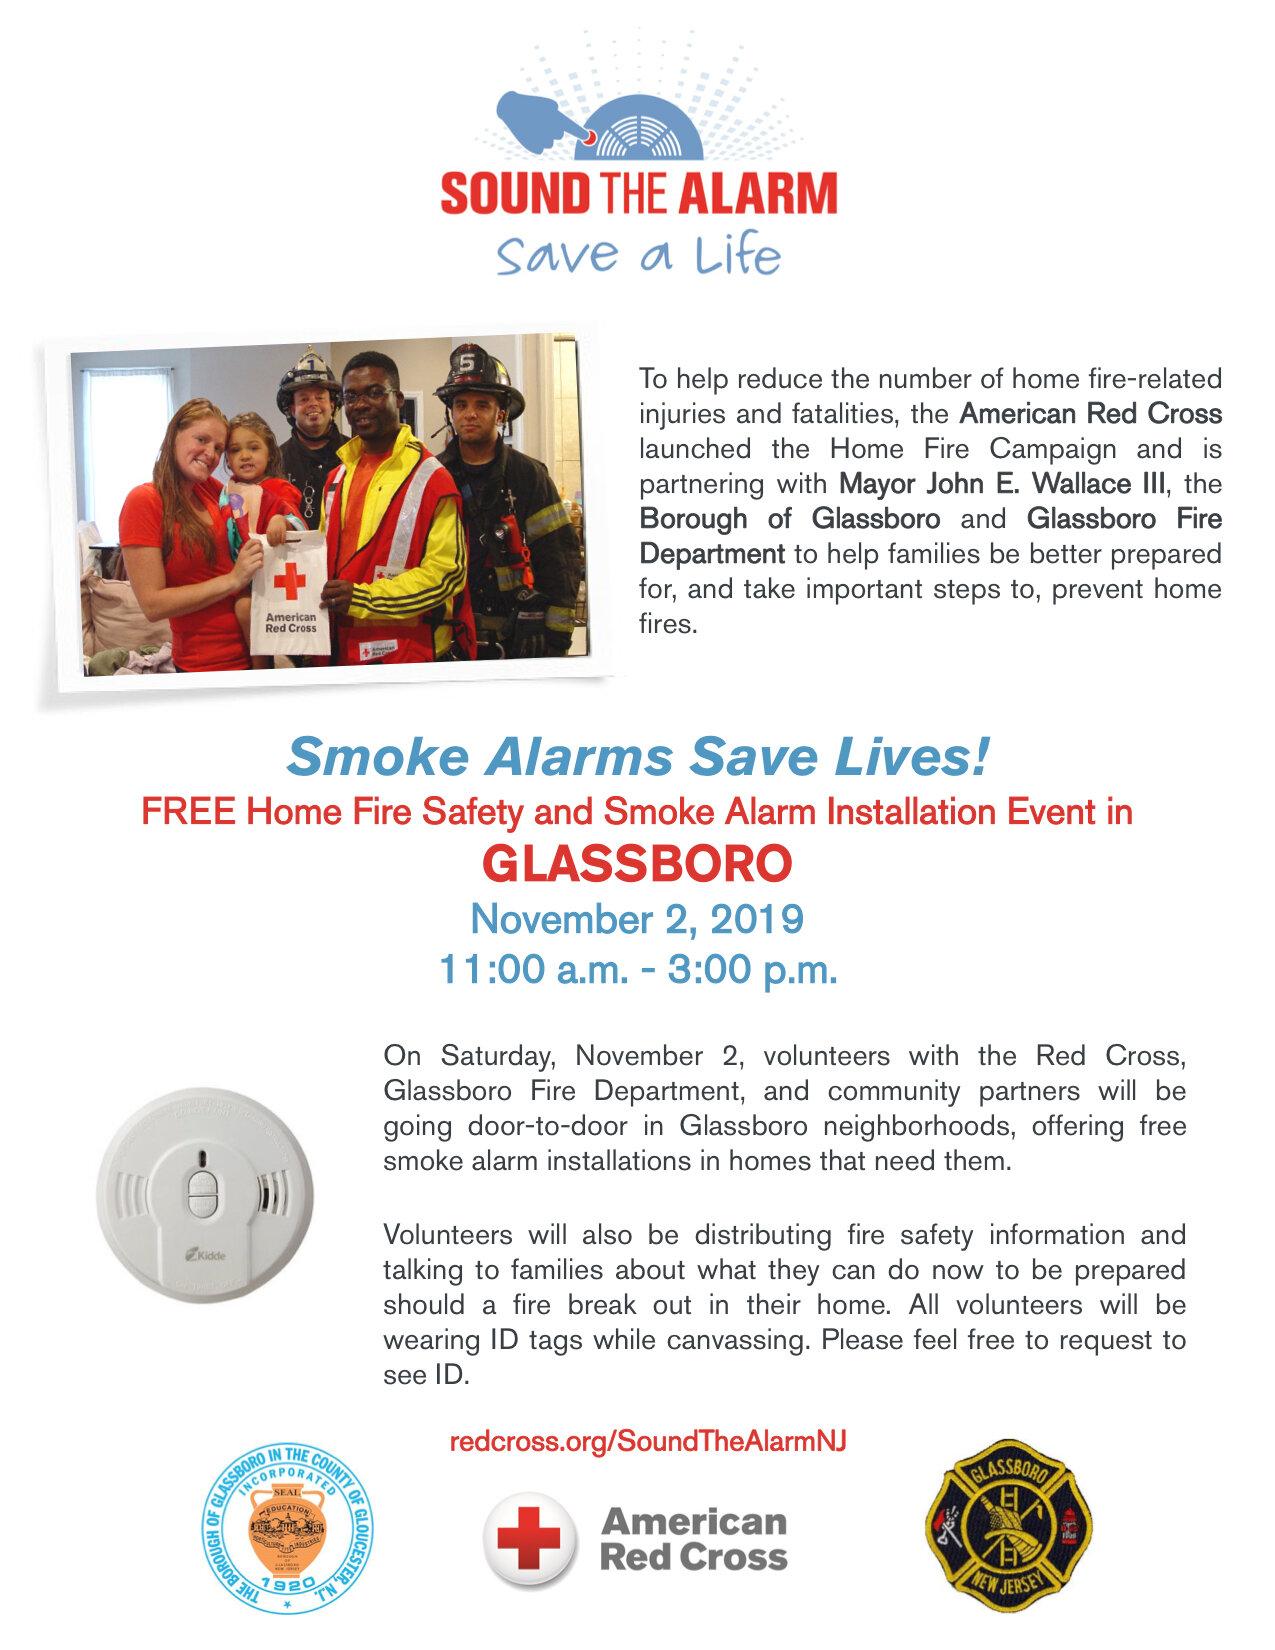 Red Cross Sound the Alarm Glassboro Community Notification Flyer - 11.2.19 Eng-Span.jpeg